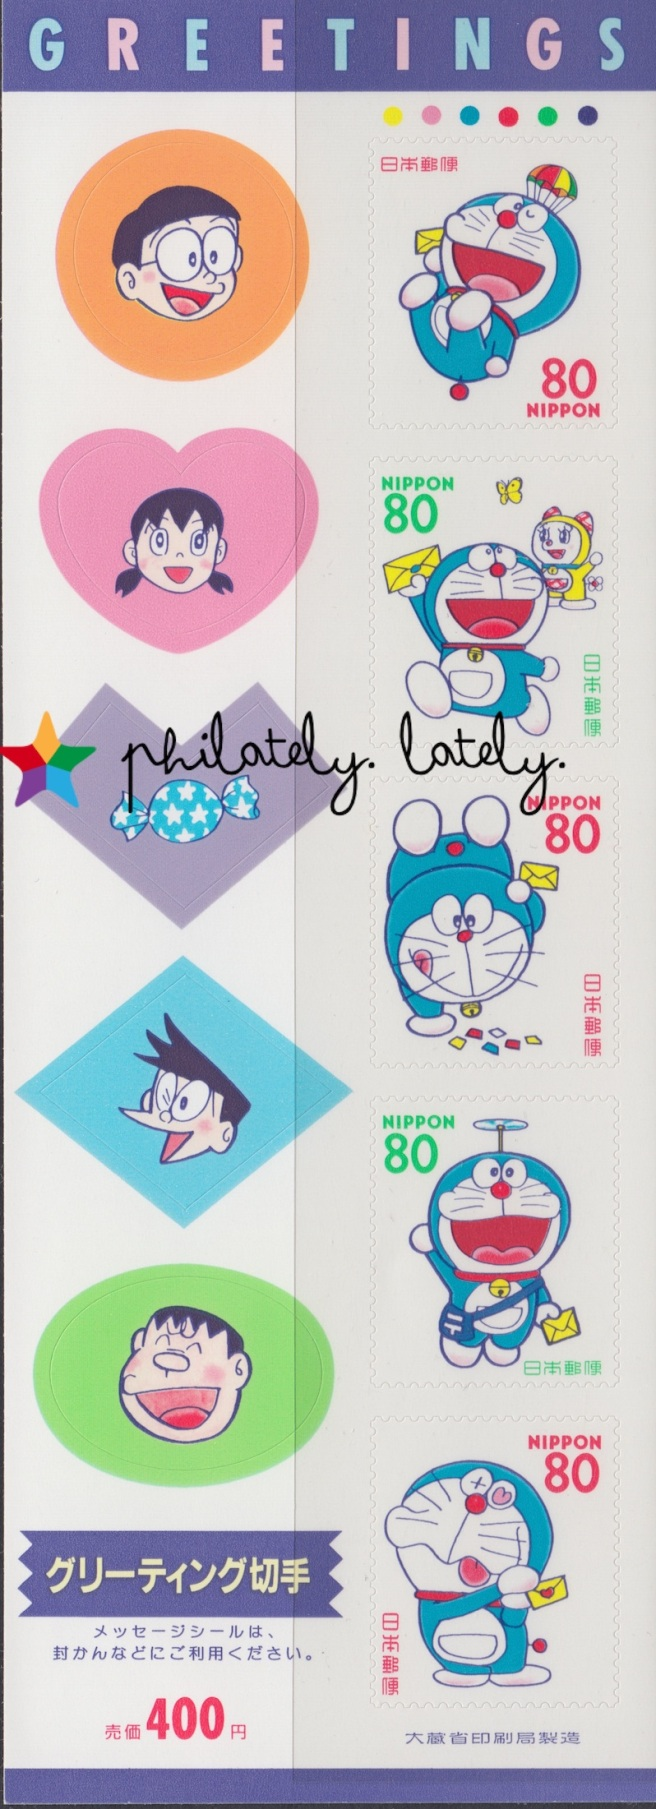 003_Japan_Doraemon_Stamps_1997.jpg